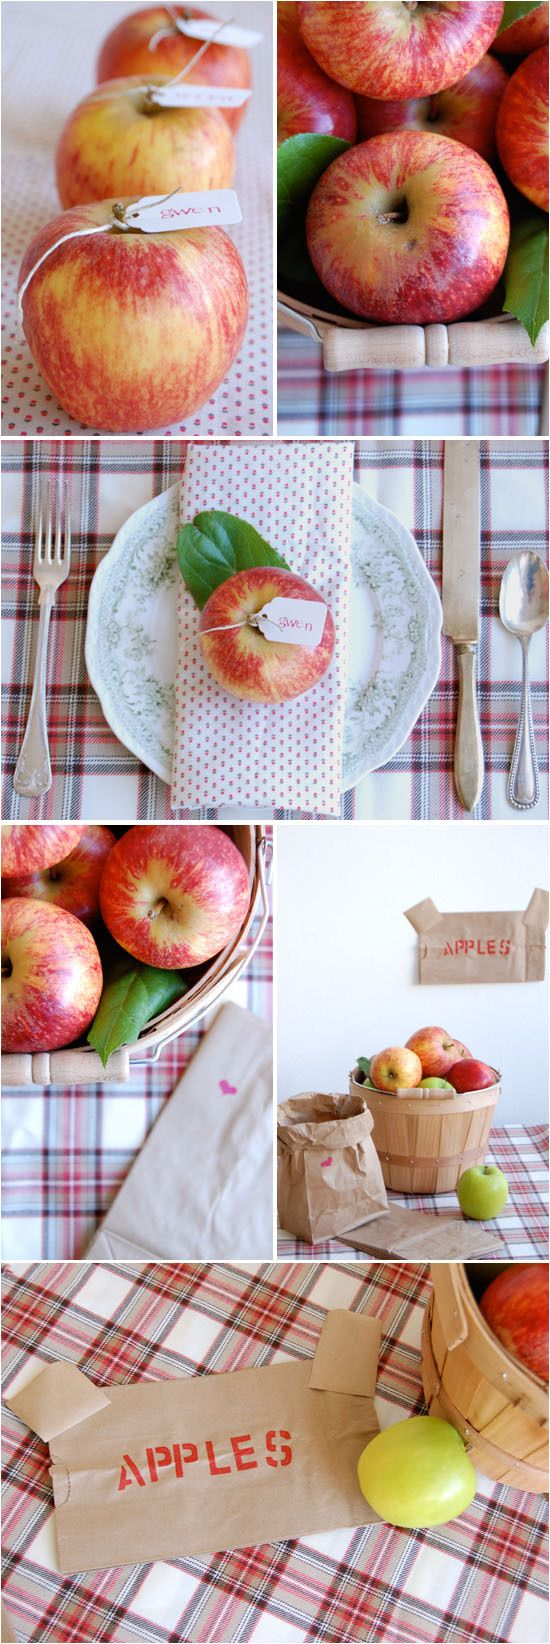 Wedding favors ideas tumblr - Apple Harvest Favors Via Project Wedding